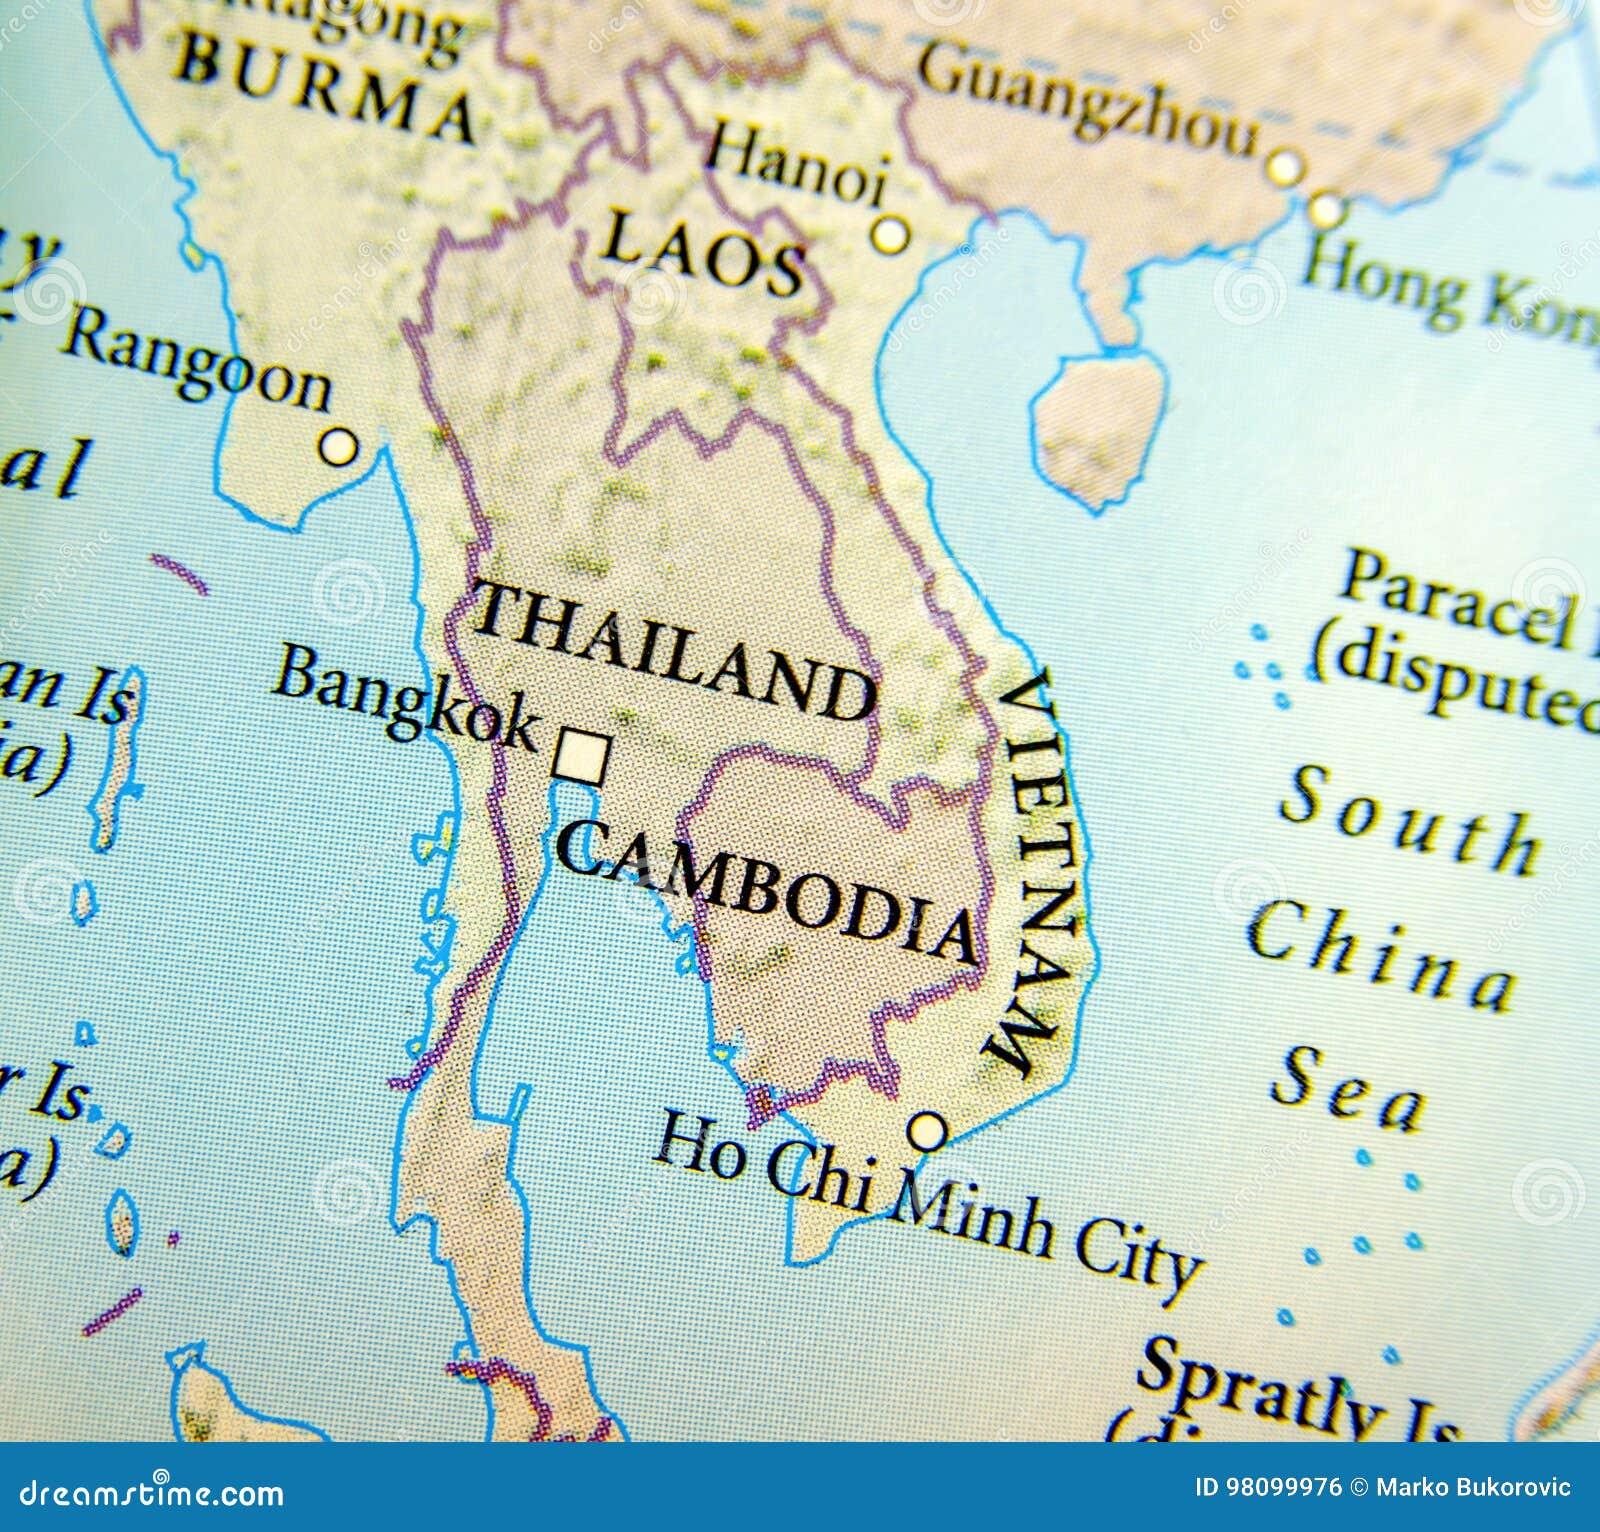 Carte Birmanie Thailande.Carte Geographique De Pays De La Thailande De La Birmanie